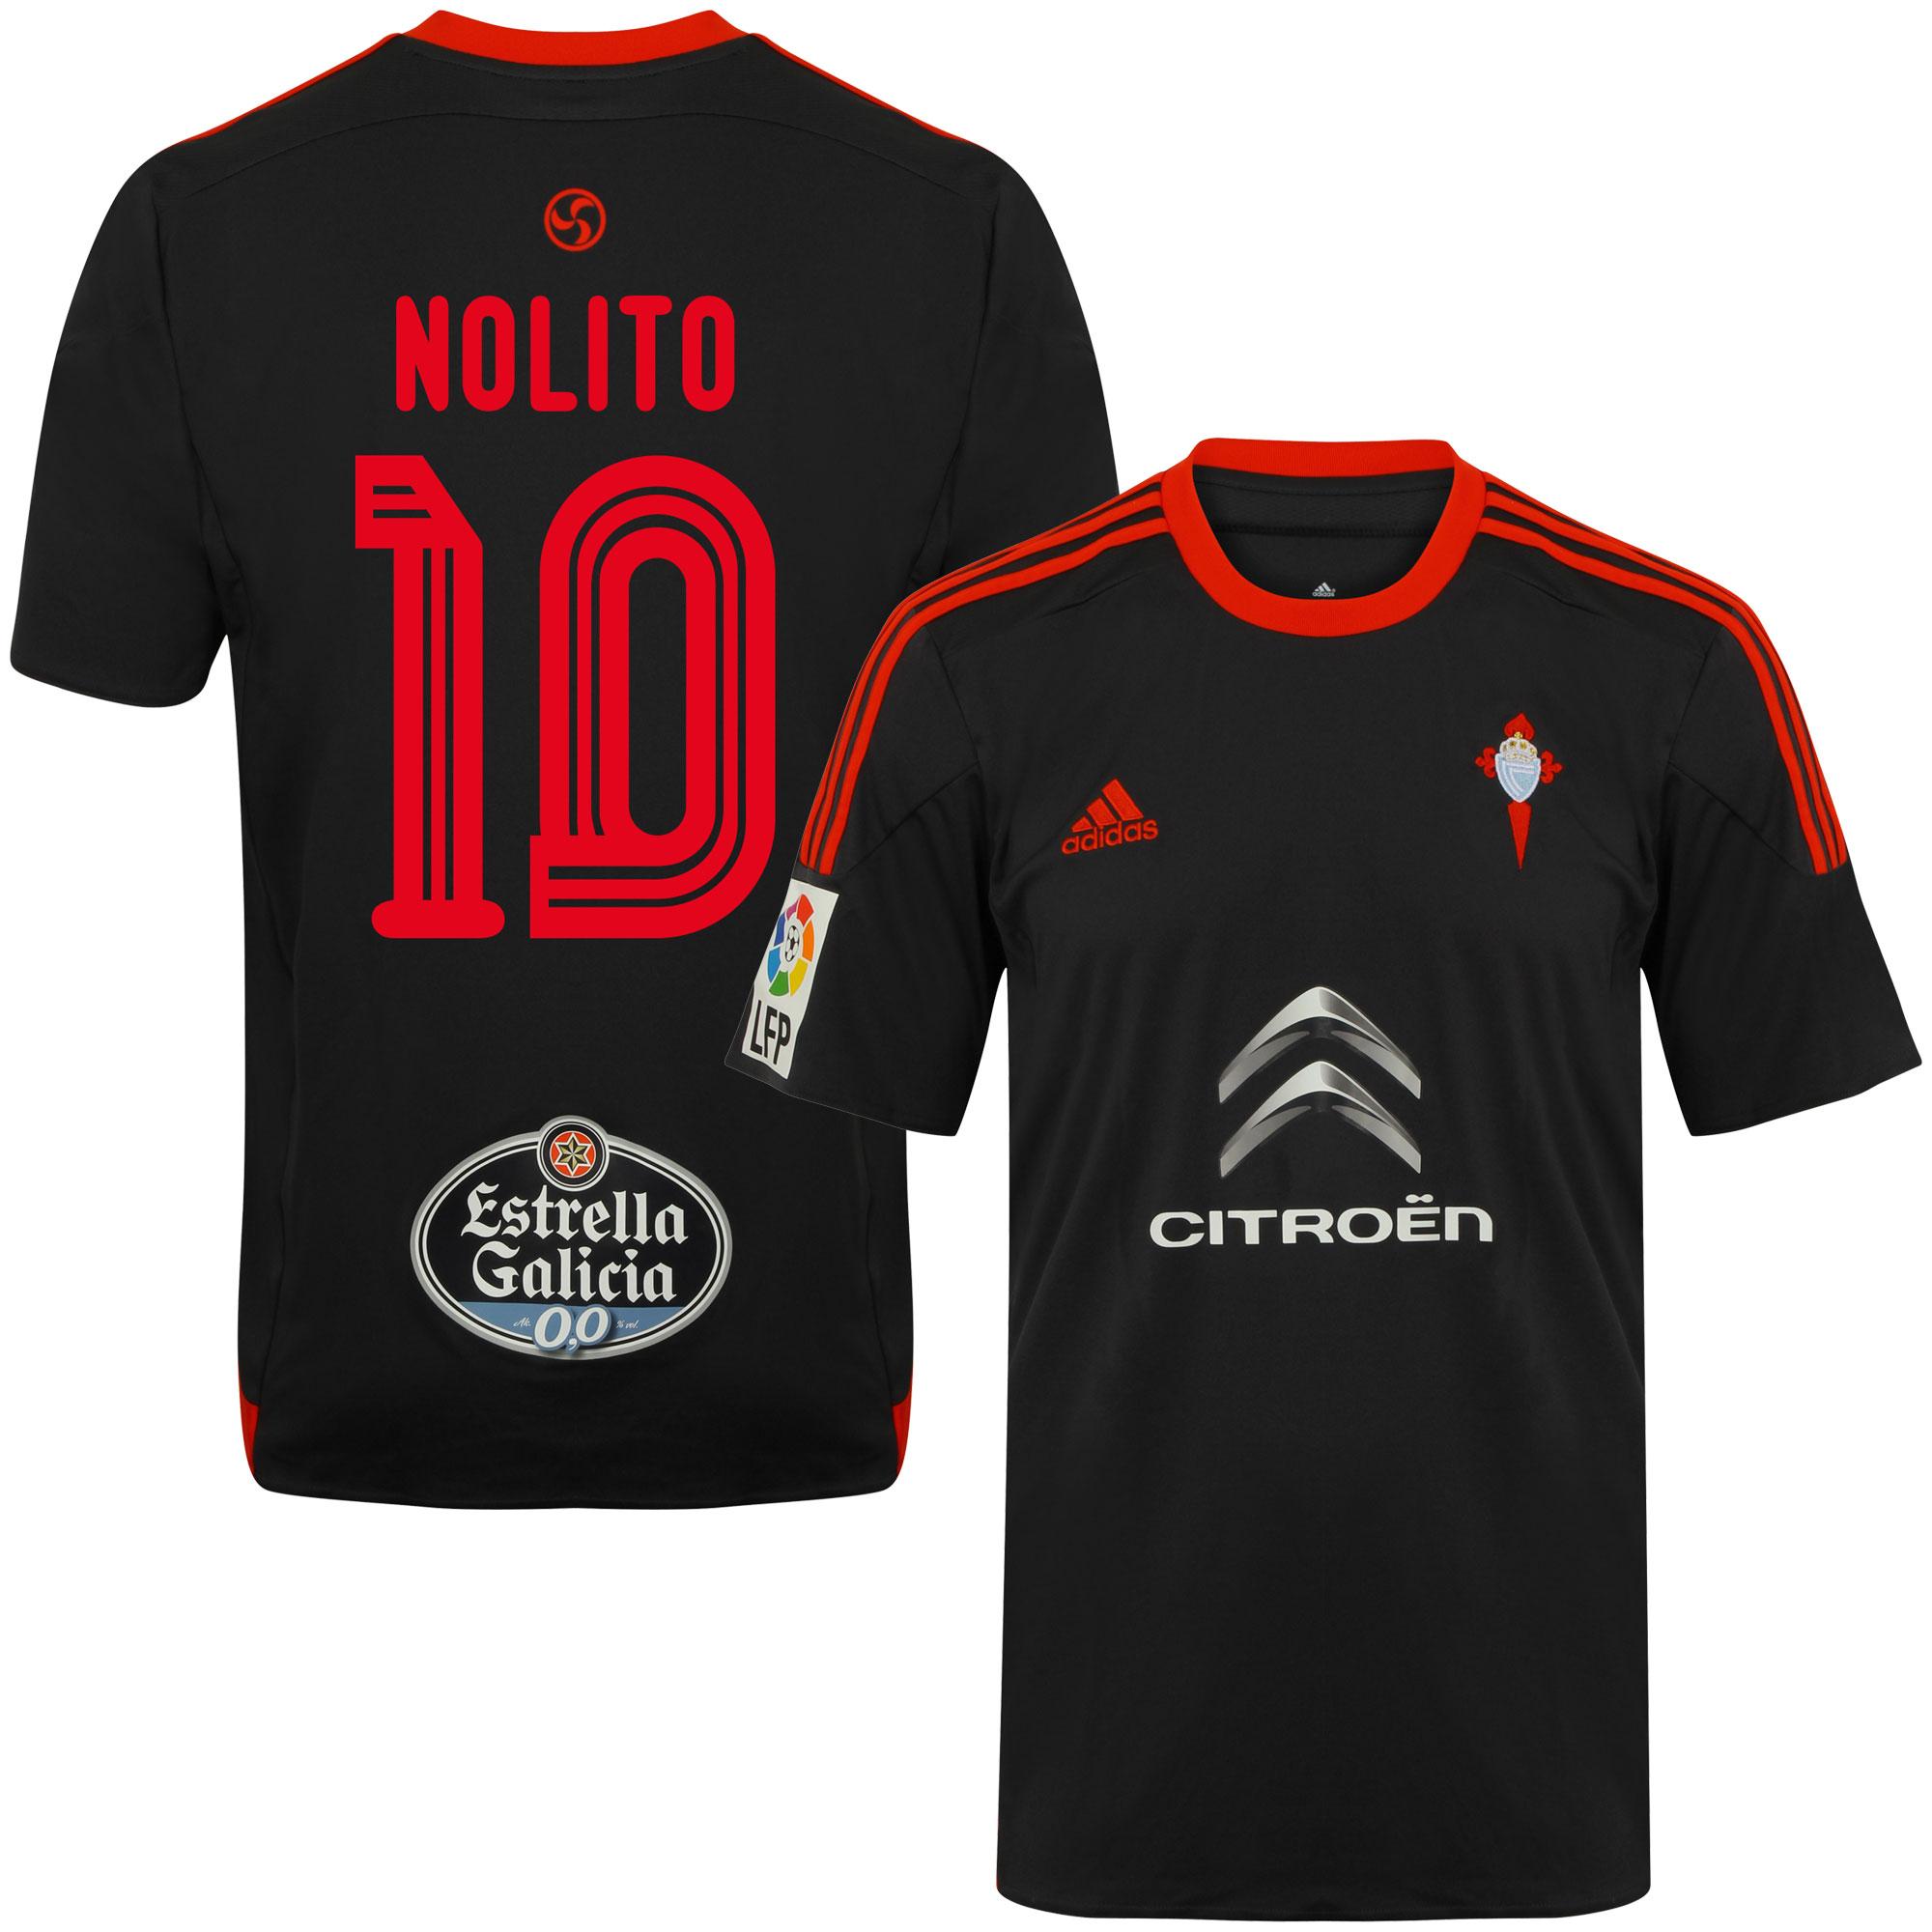 Celta Vigo Away Molito Jersey 2015 / 2016 (Fan Style Printing) - 58